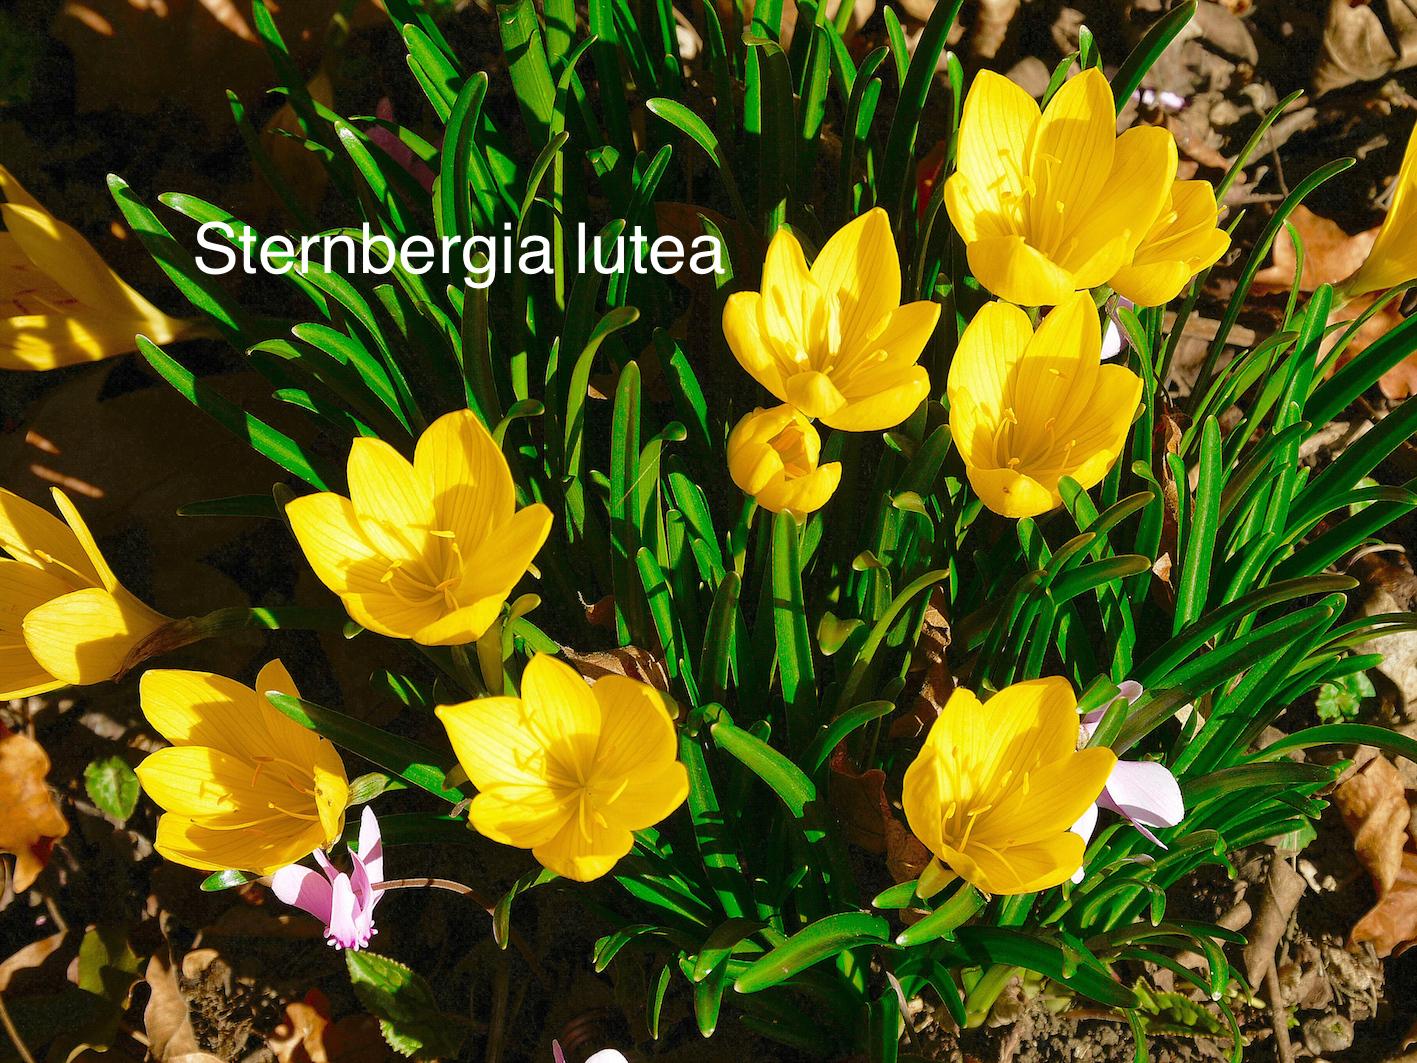 sternbergia